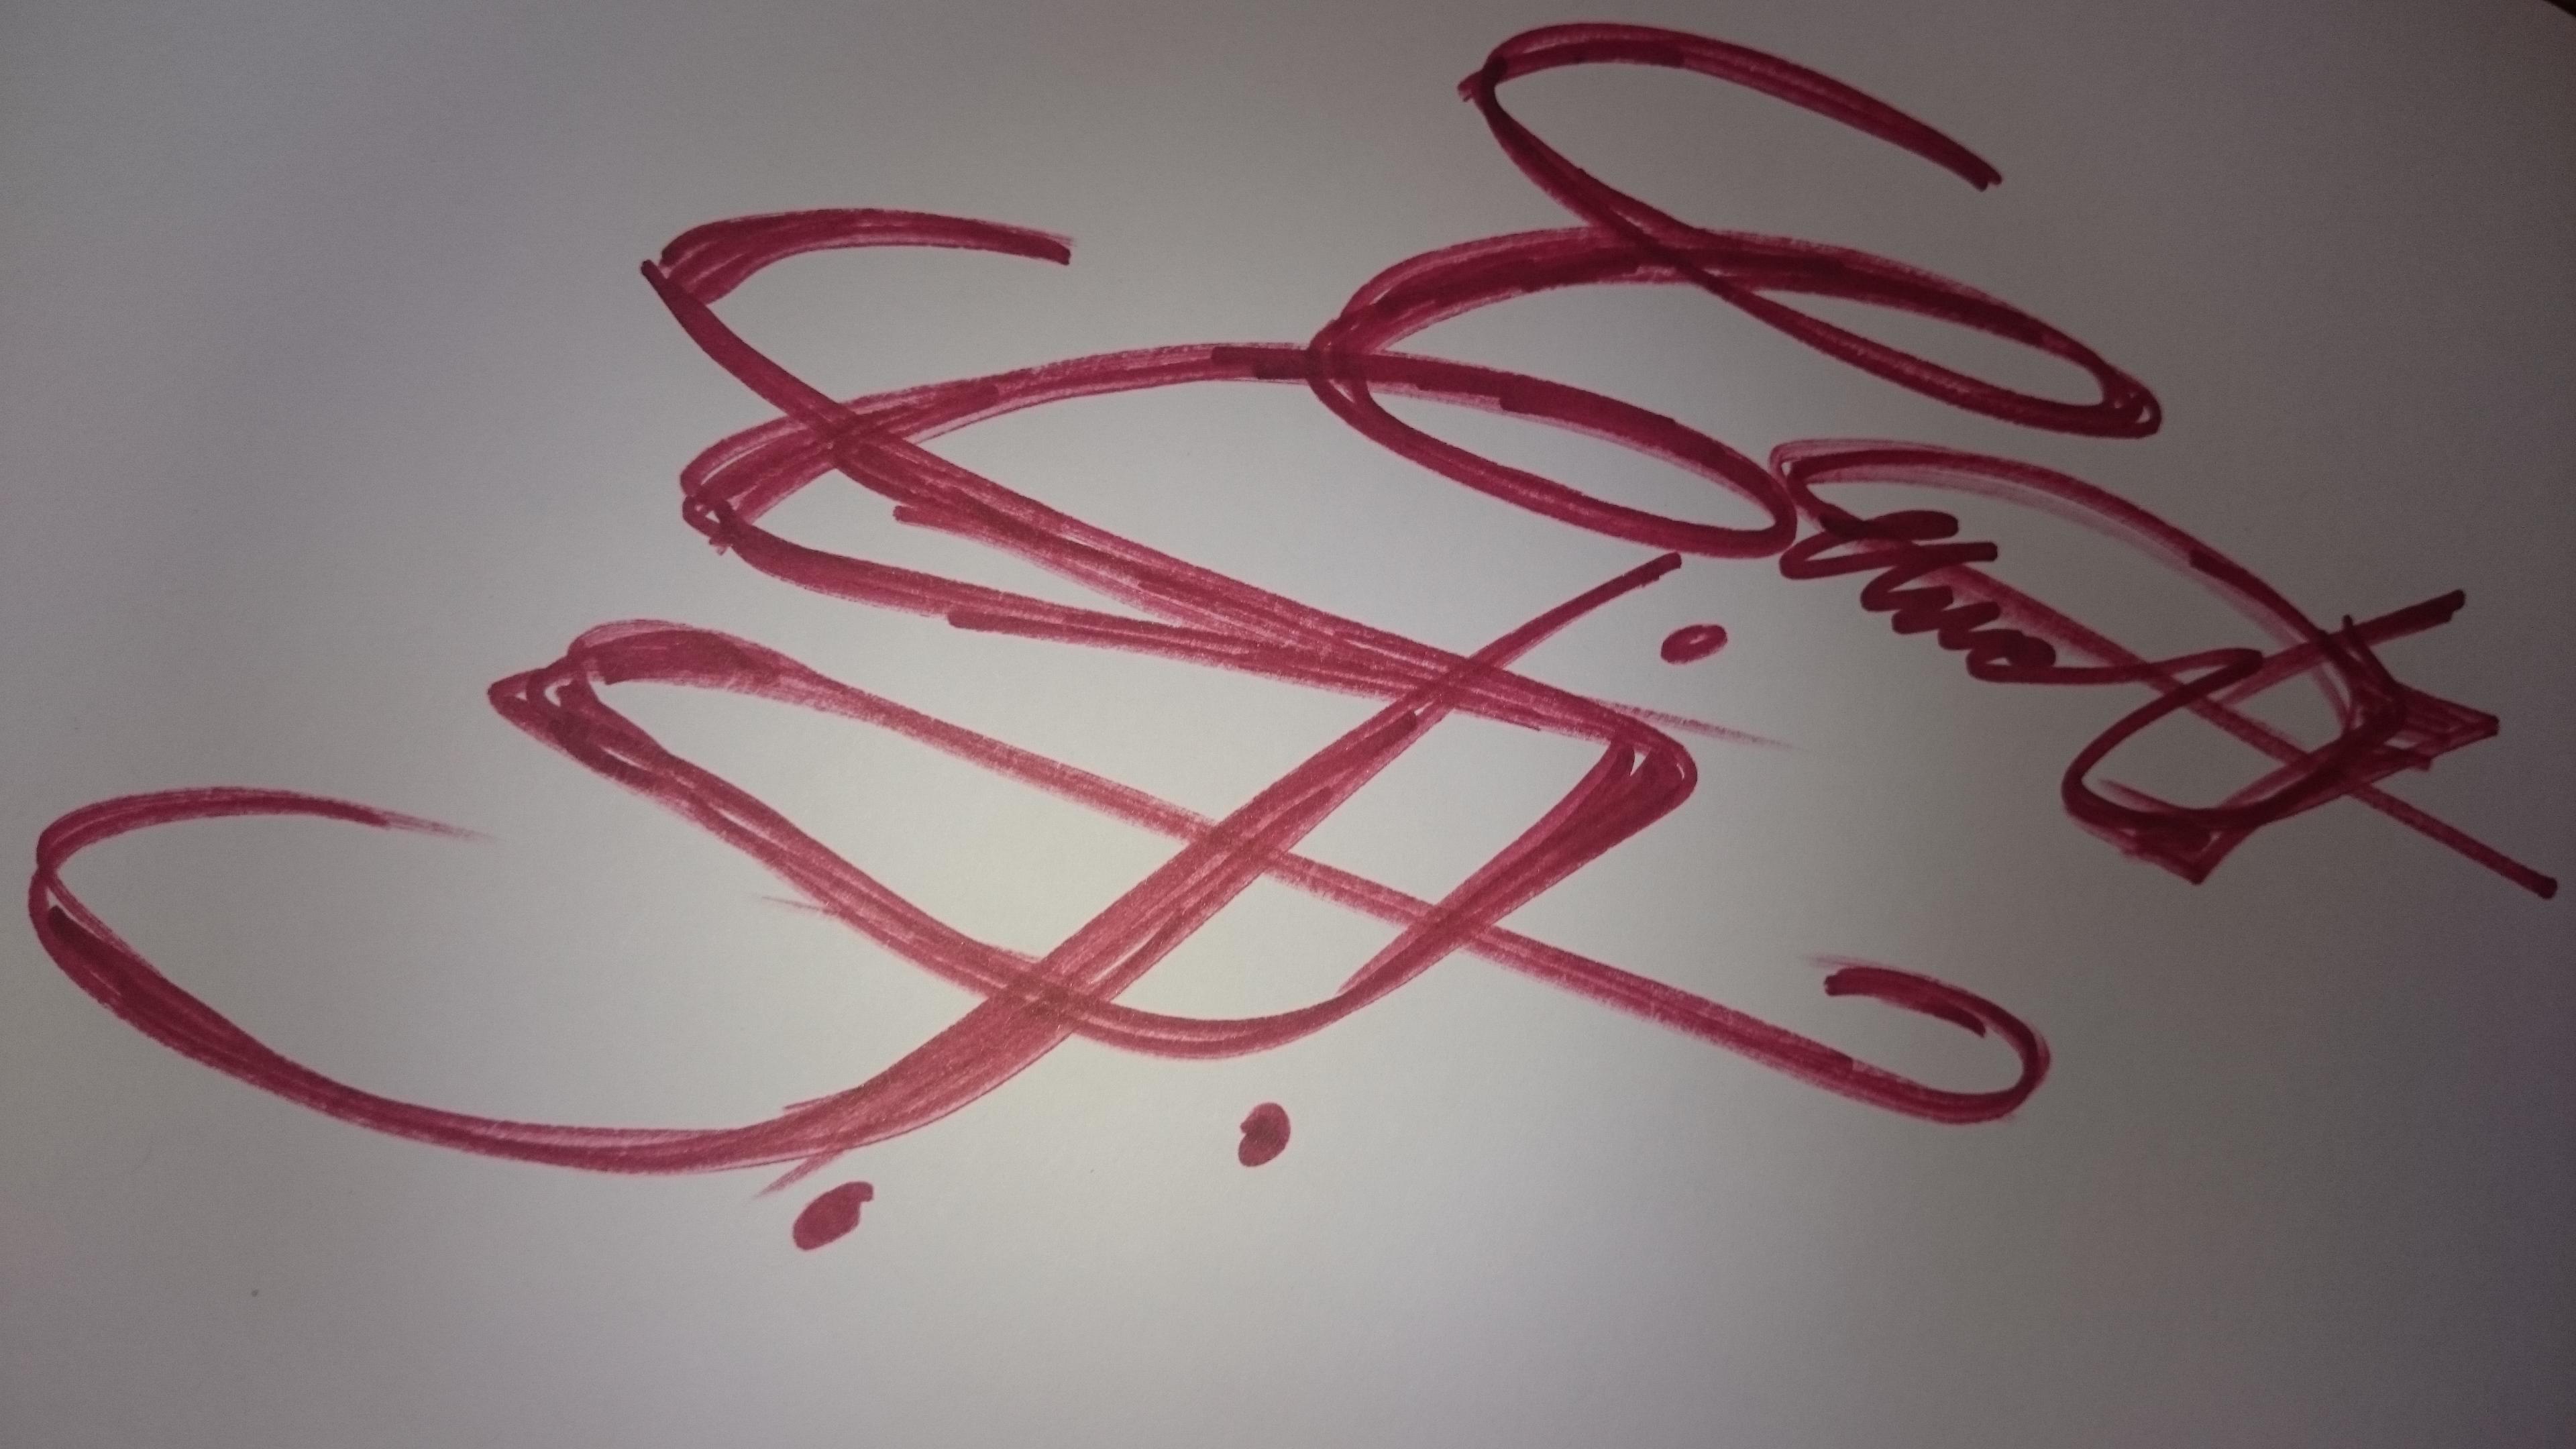 cDg- dANIELA  GEORGIANA CERNAT's Signature